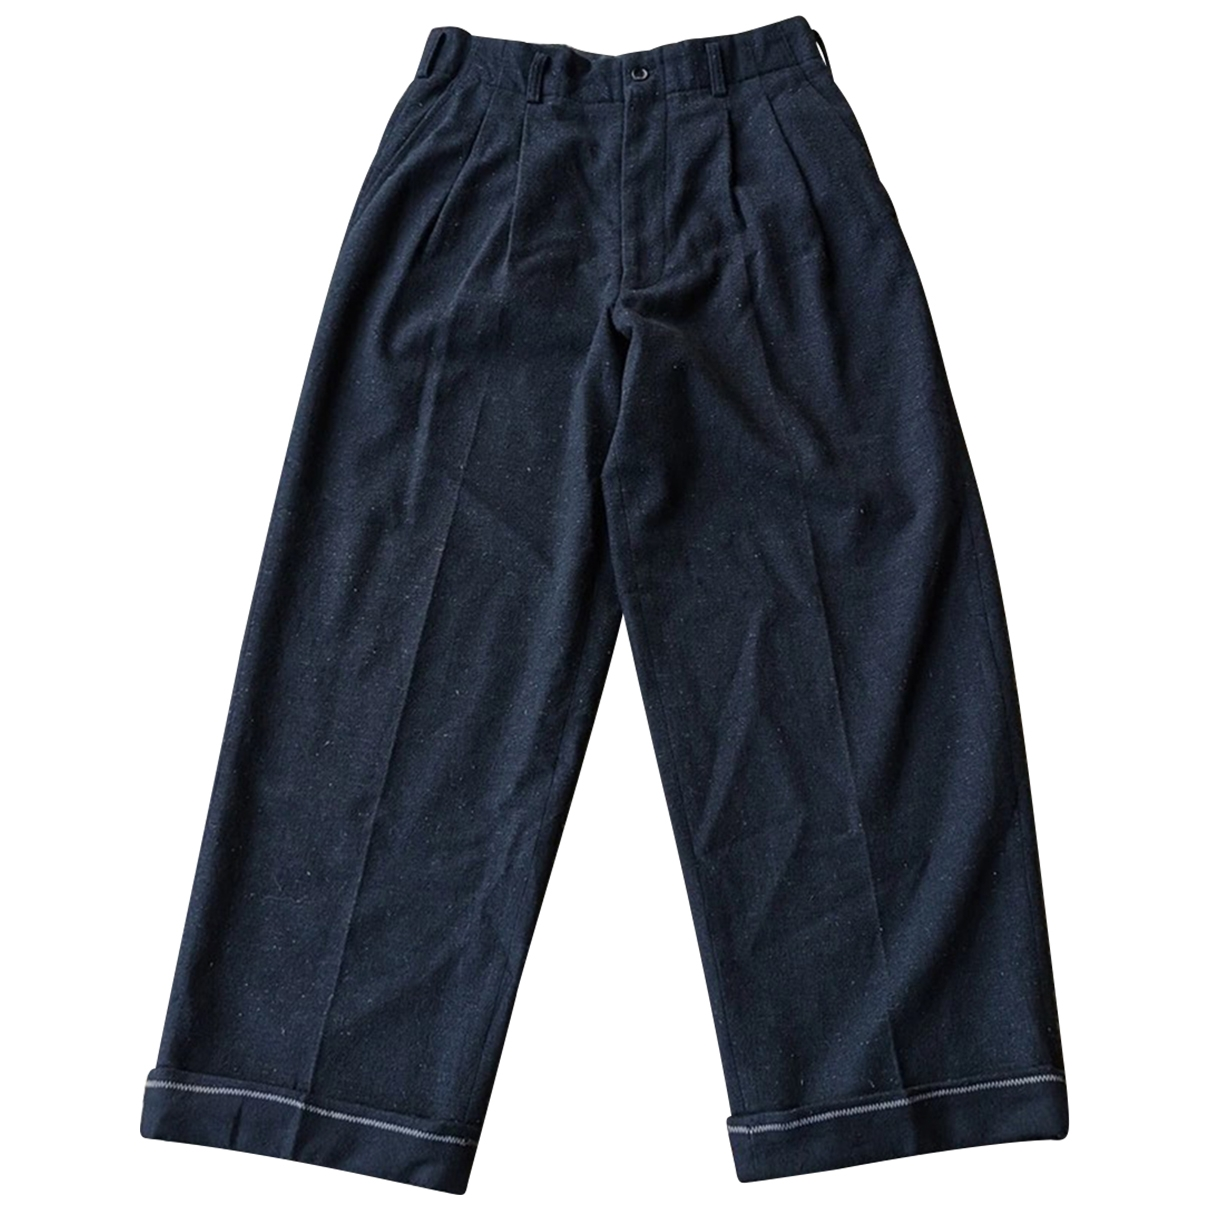 Comme Des Garcons \N Black Wool Trousers for Men S International